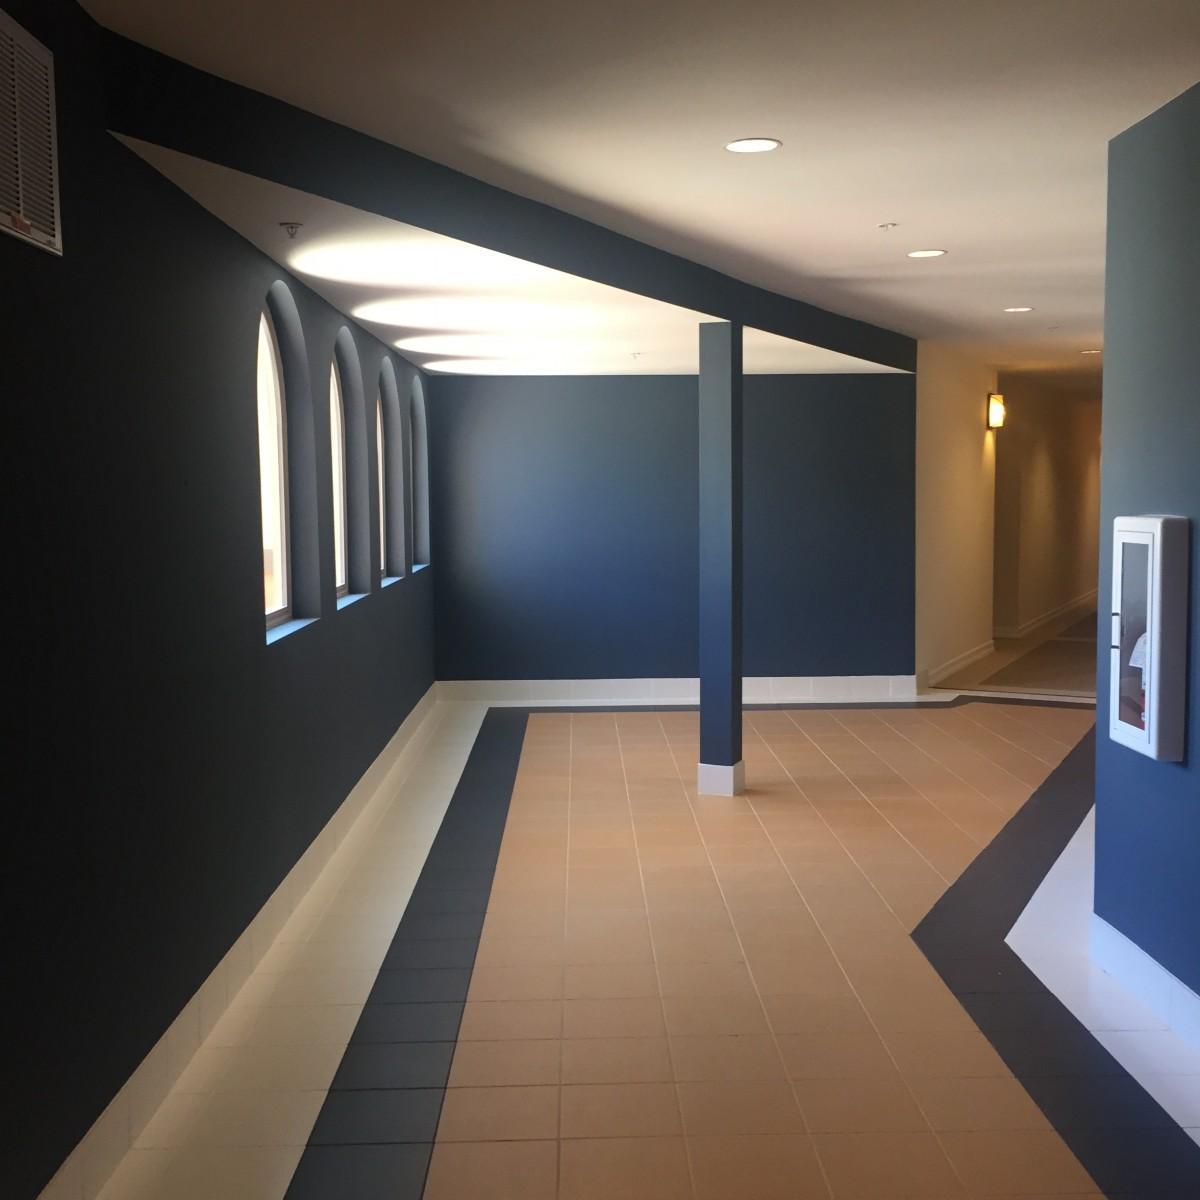 Free Images Hall Room Lighting Interior Design